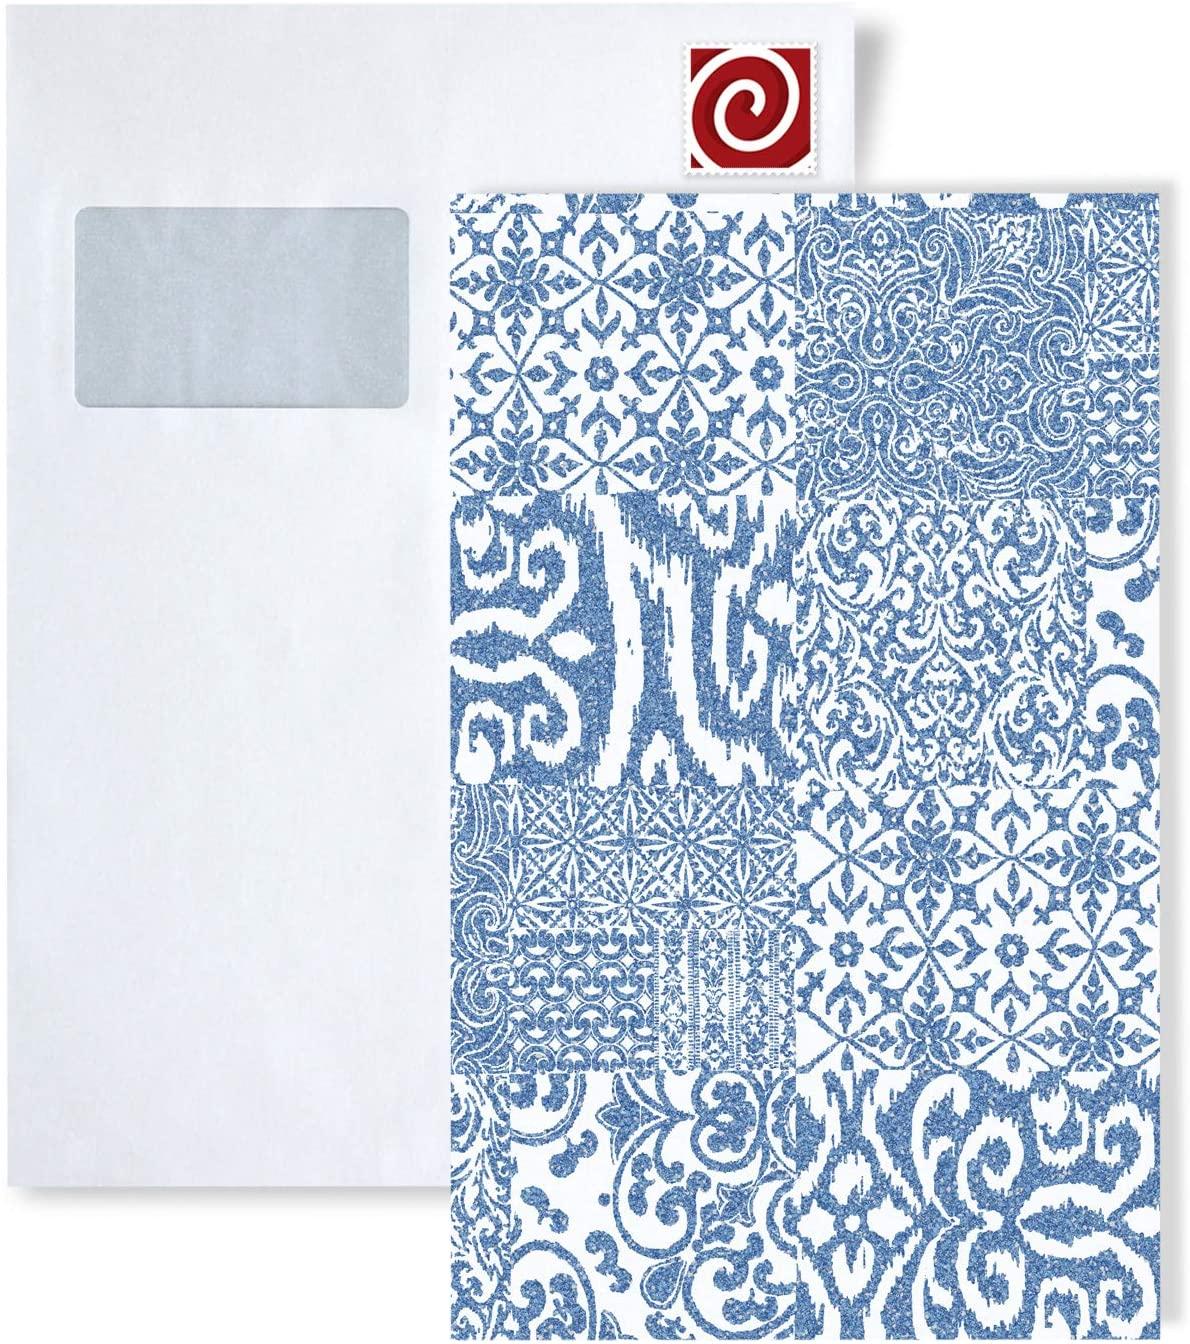 1 Sample Piece S-VD219149-DI Profhome Elegant Baroque Collage Wallpaper Sample in DIN A4 Size